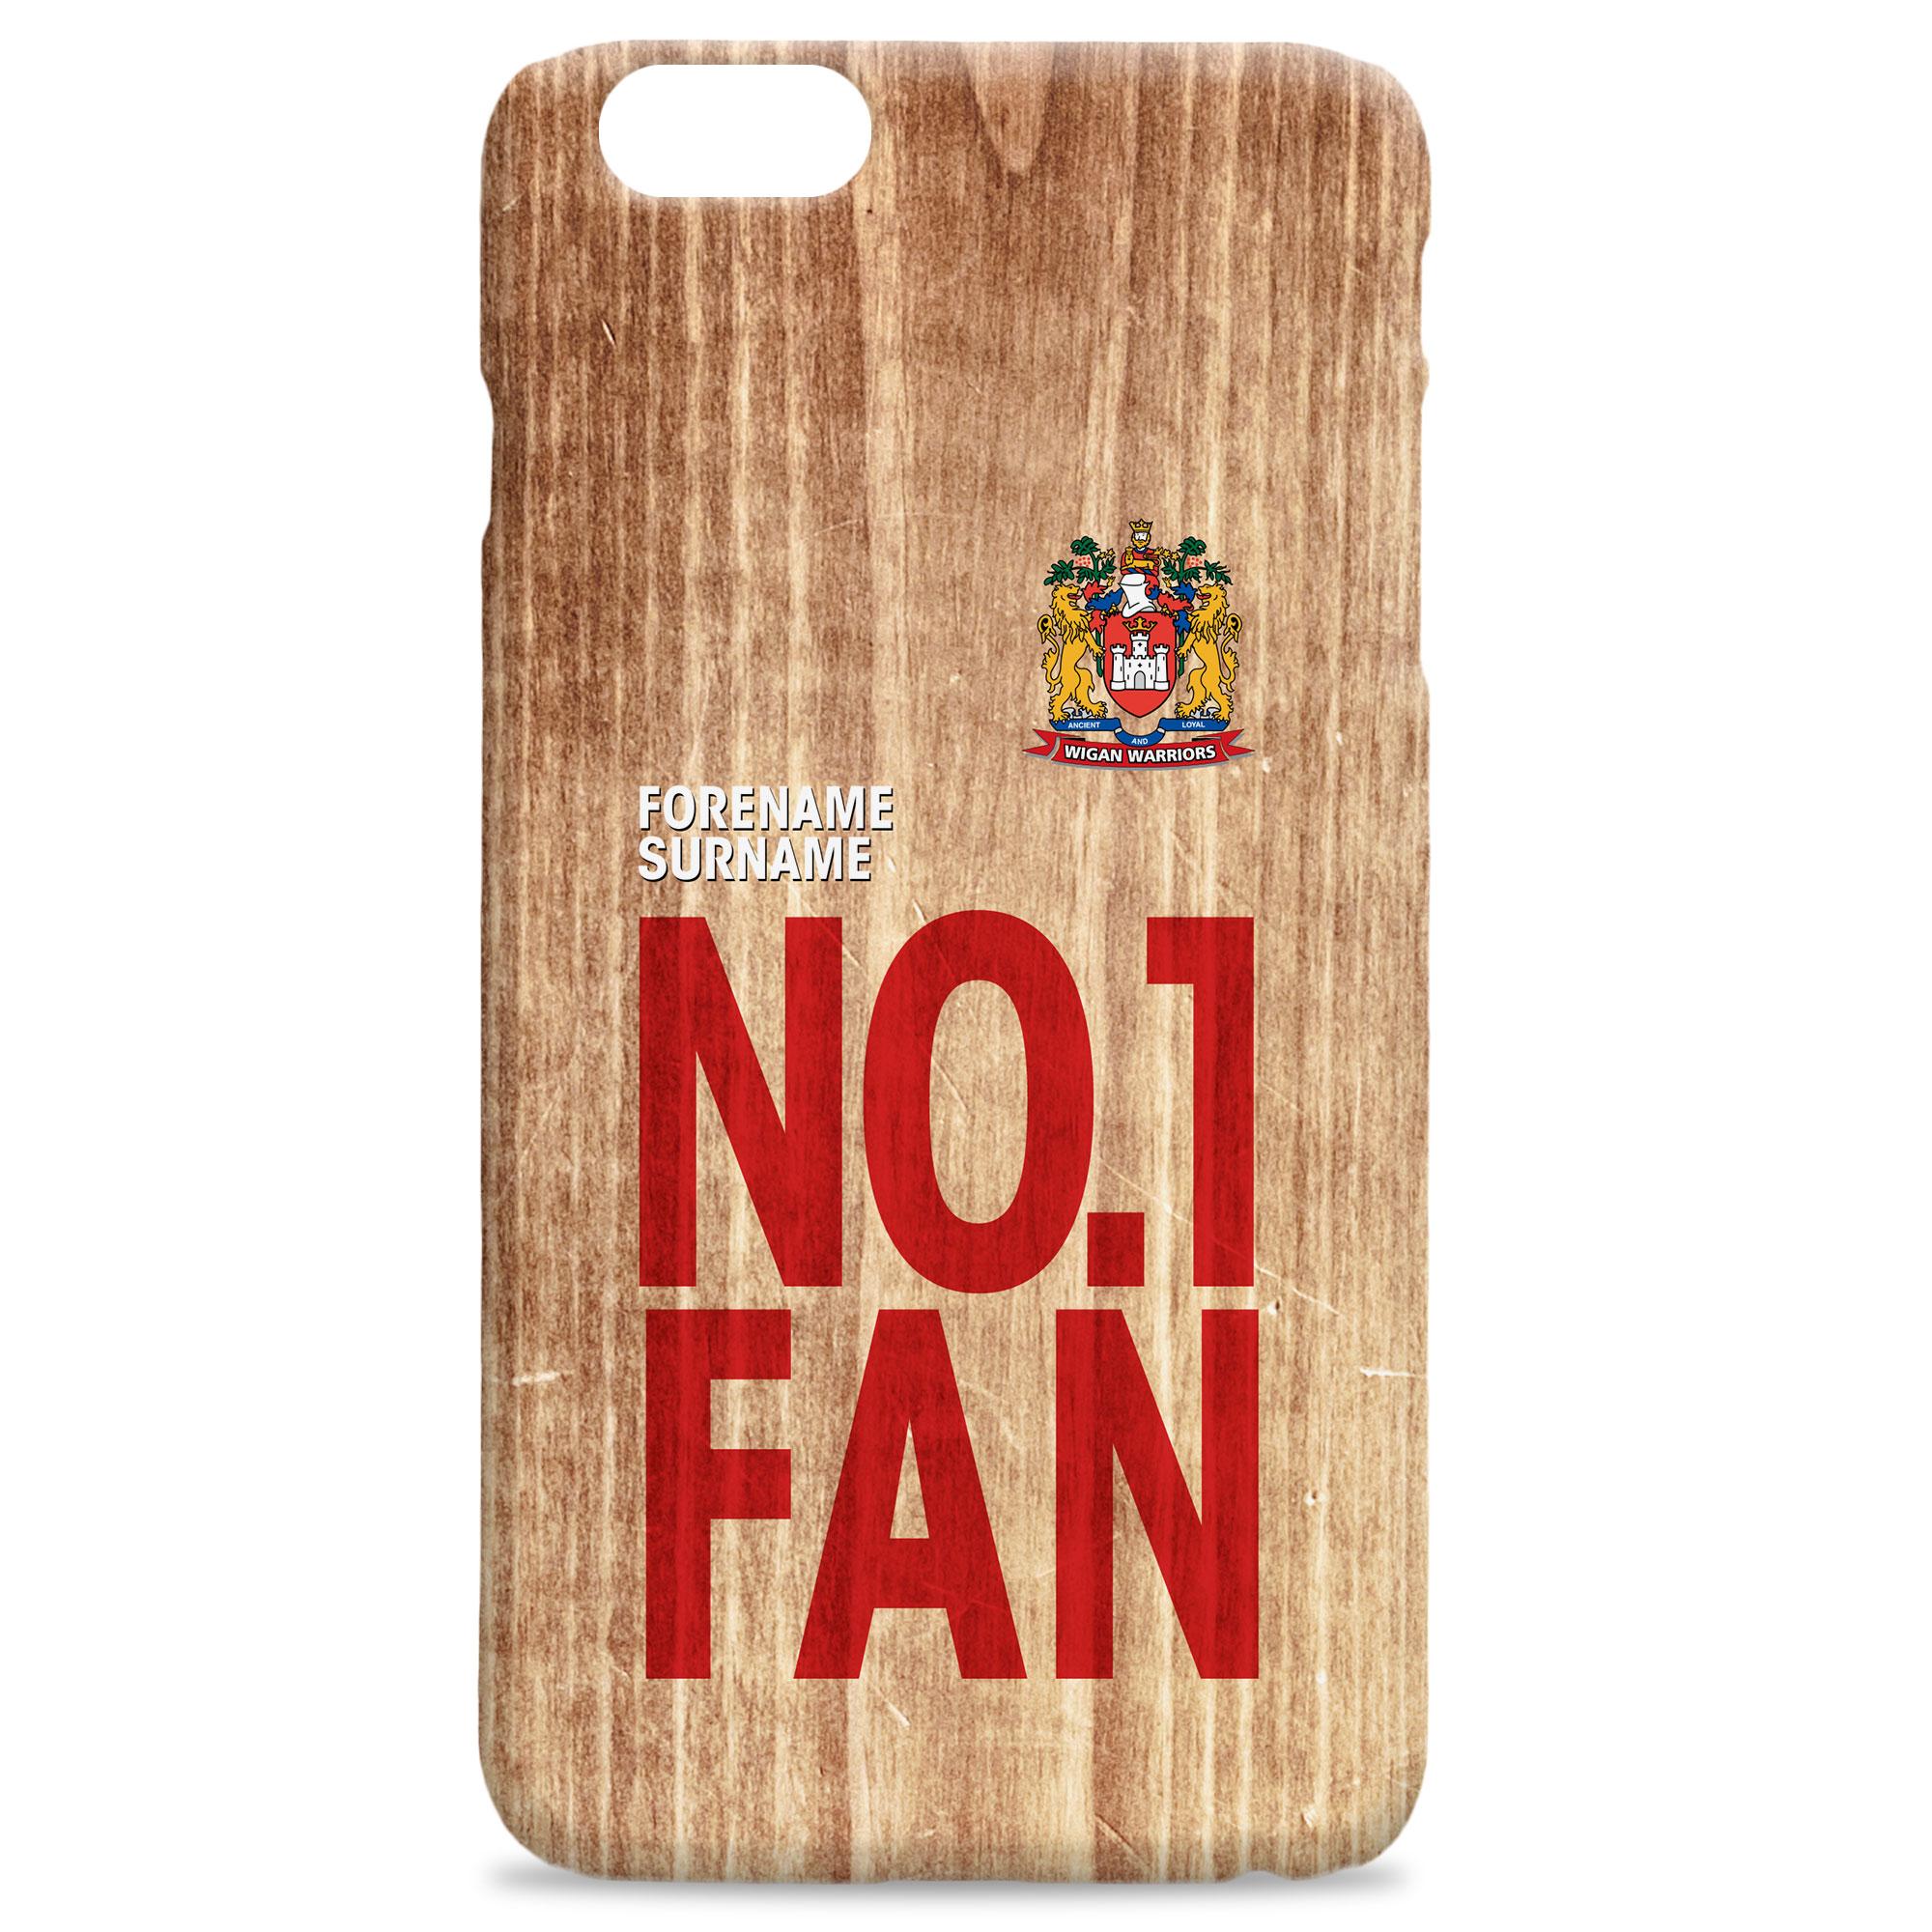 Wigan Warriors No 1 Fan Hard Back Phone Case